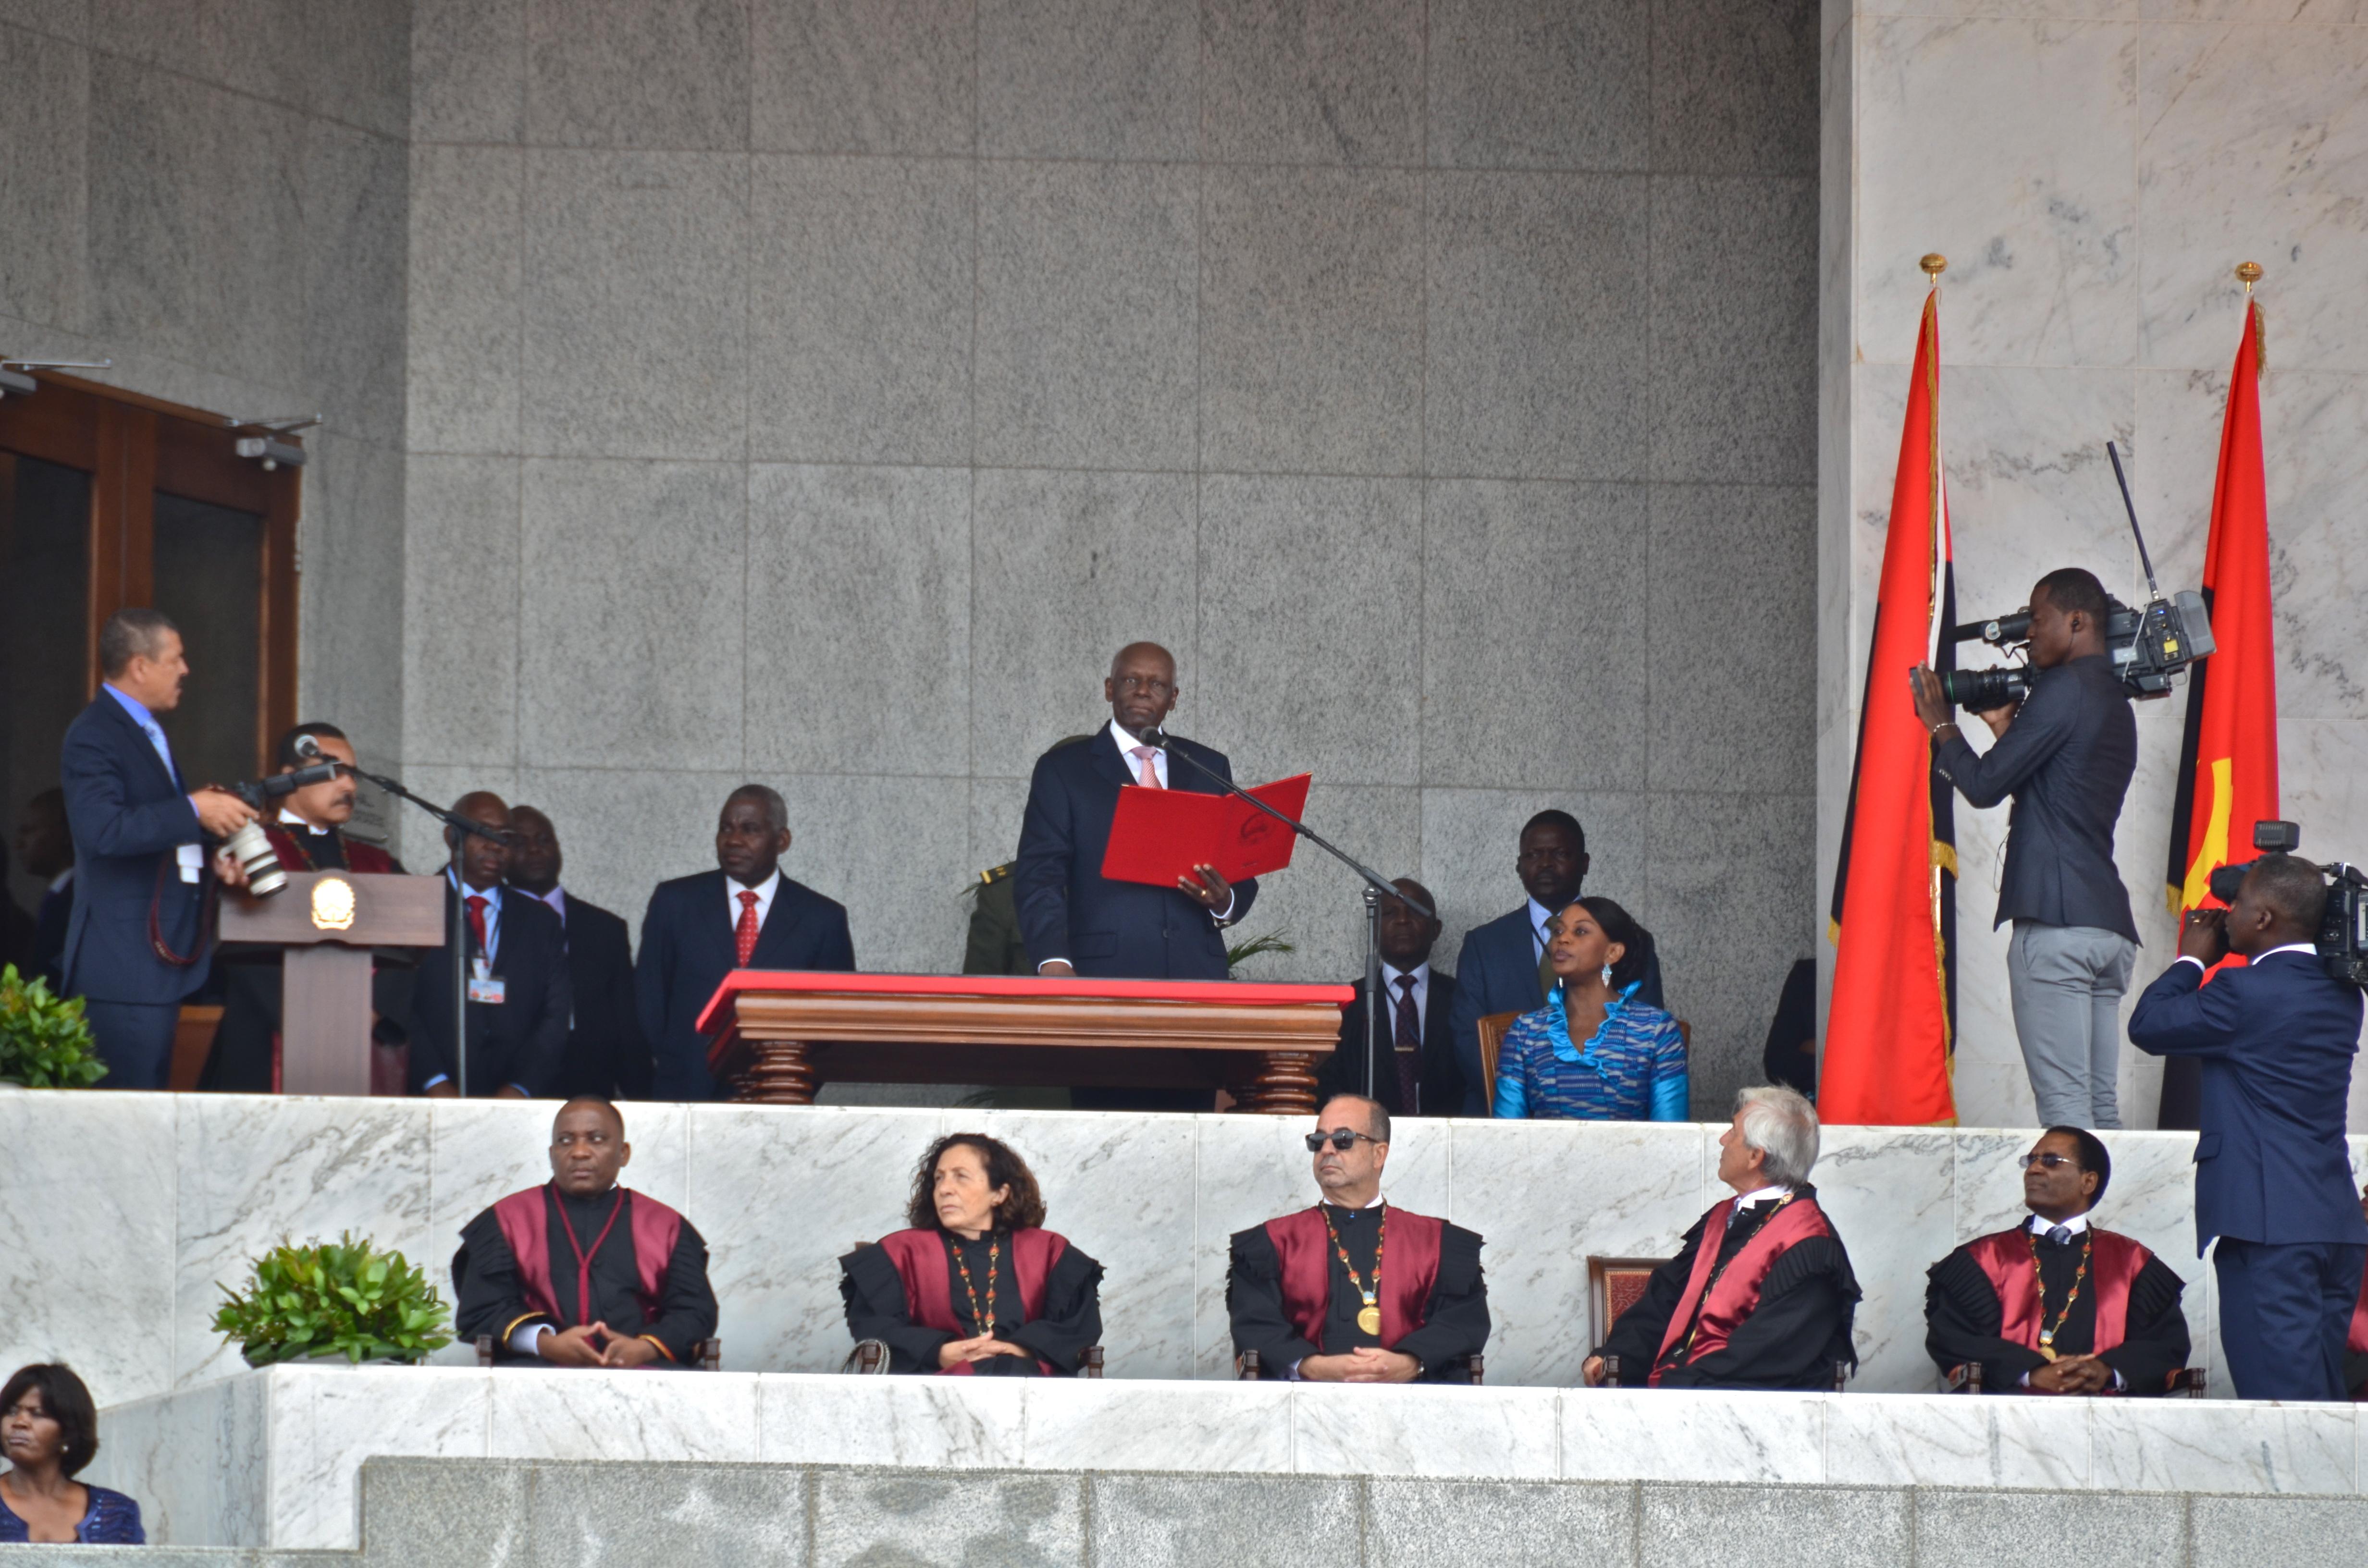 Juramento do Presidente República